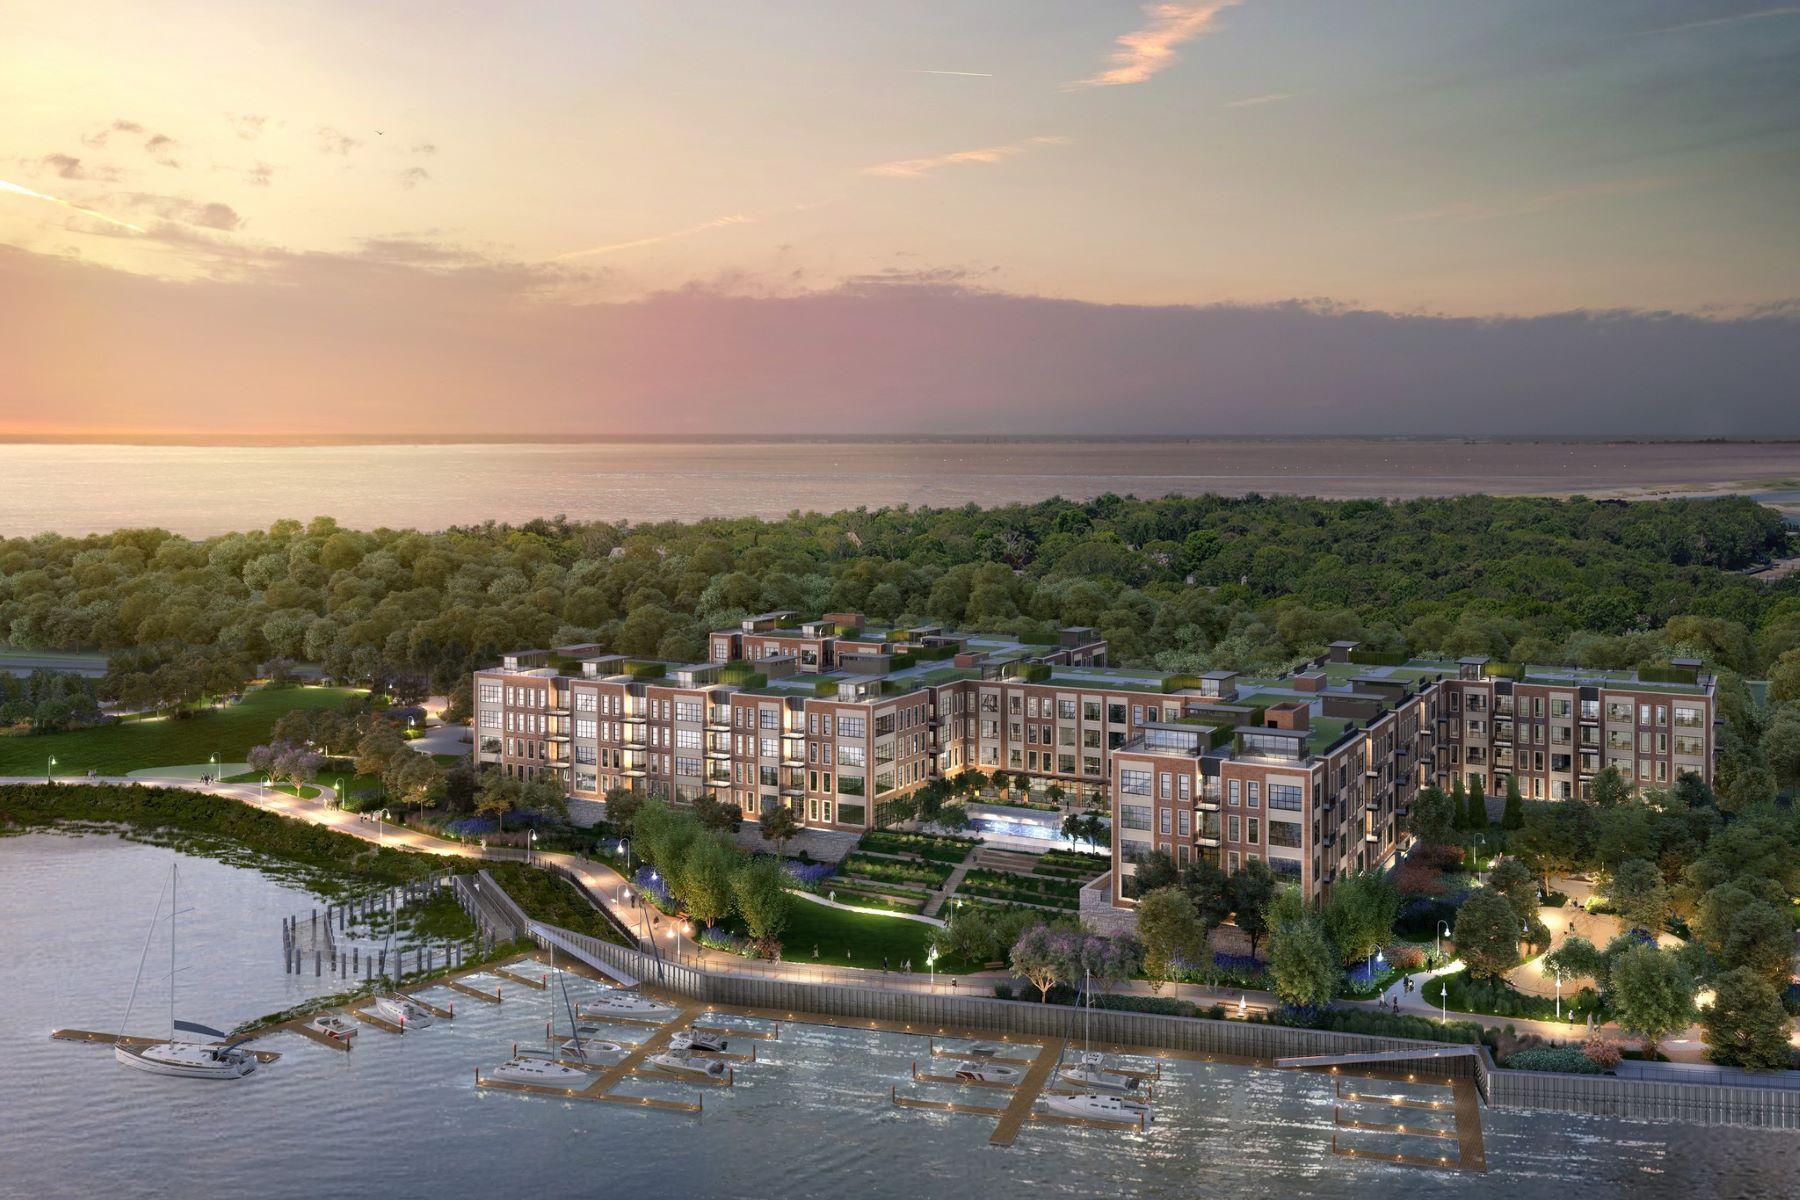 Condominium for Sale at 100 Garvies Point Rd , 1310, Glen Cove, NY 11542 100 Garvies Point Rd 1310 Glen Cove, New York 11542 United States